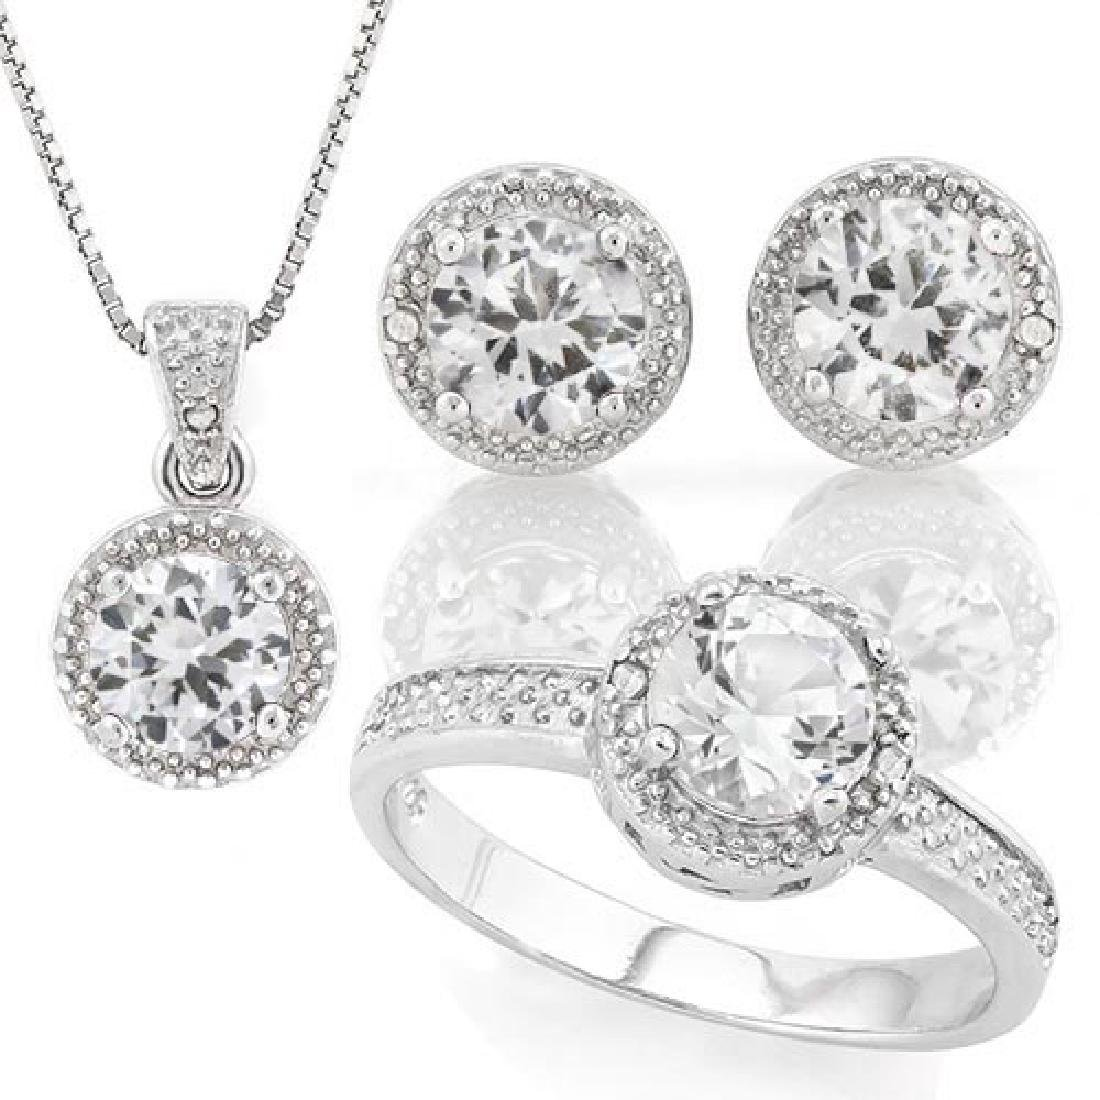 4 CARAT CREATED WHITE SAPPHIRES & GENUINE DIAMONDS 925